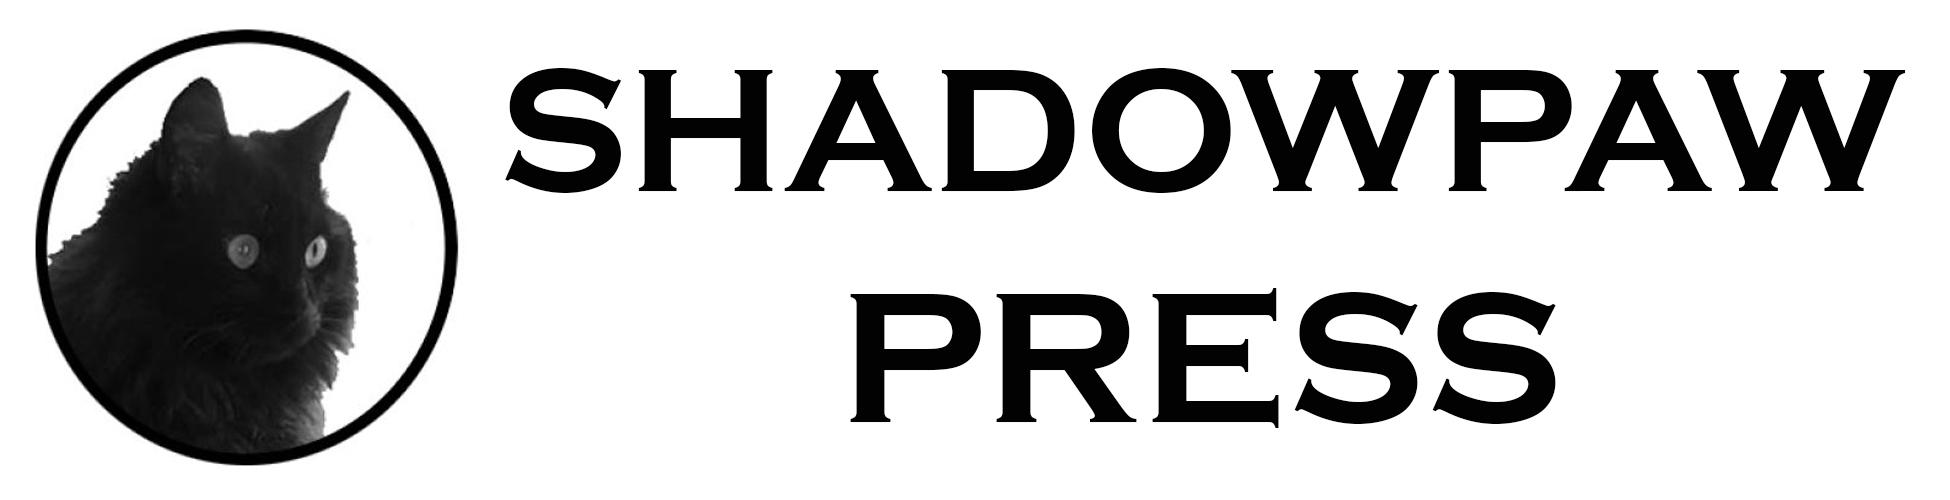 Shadowpaw Press